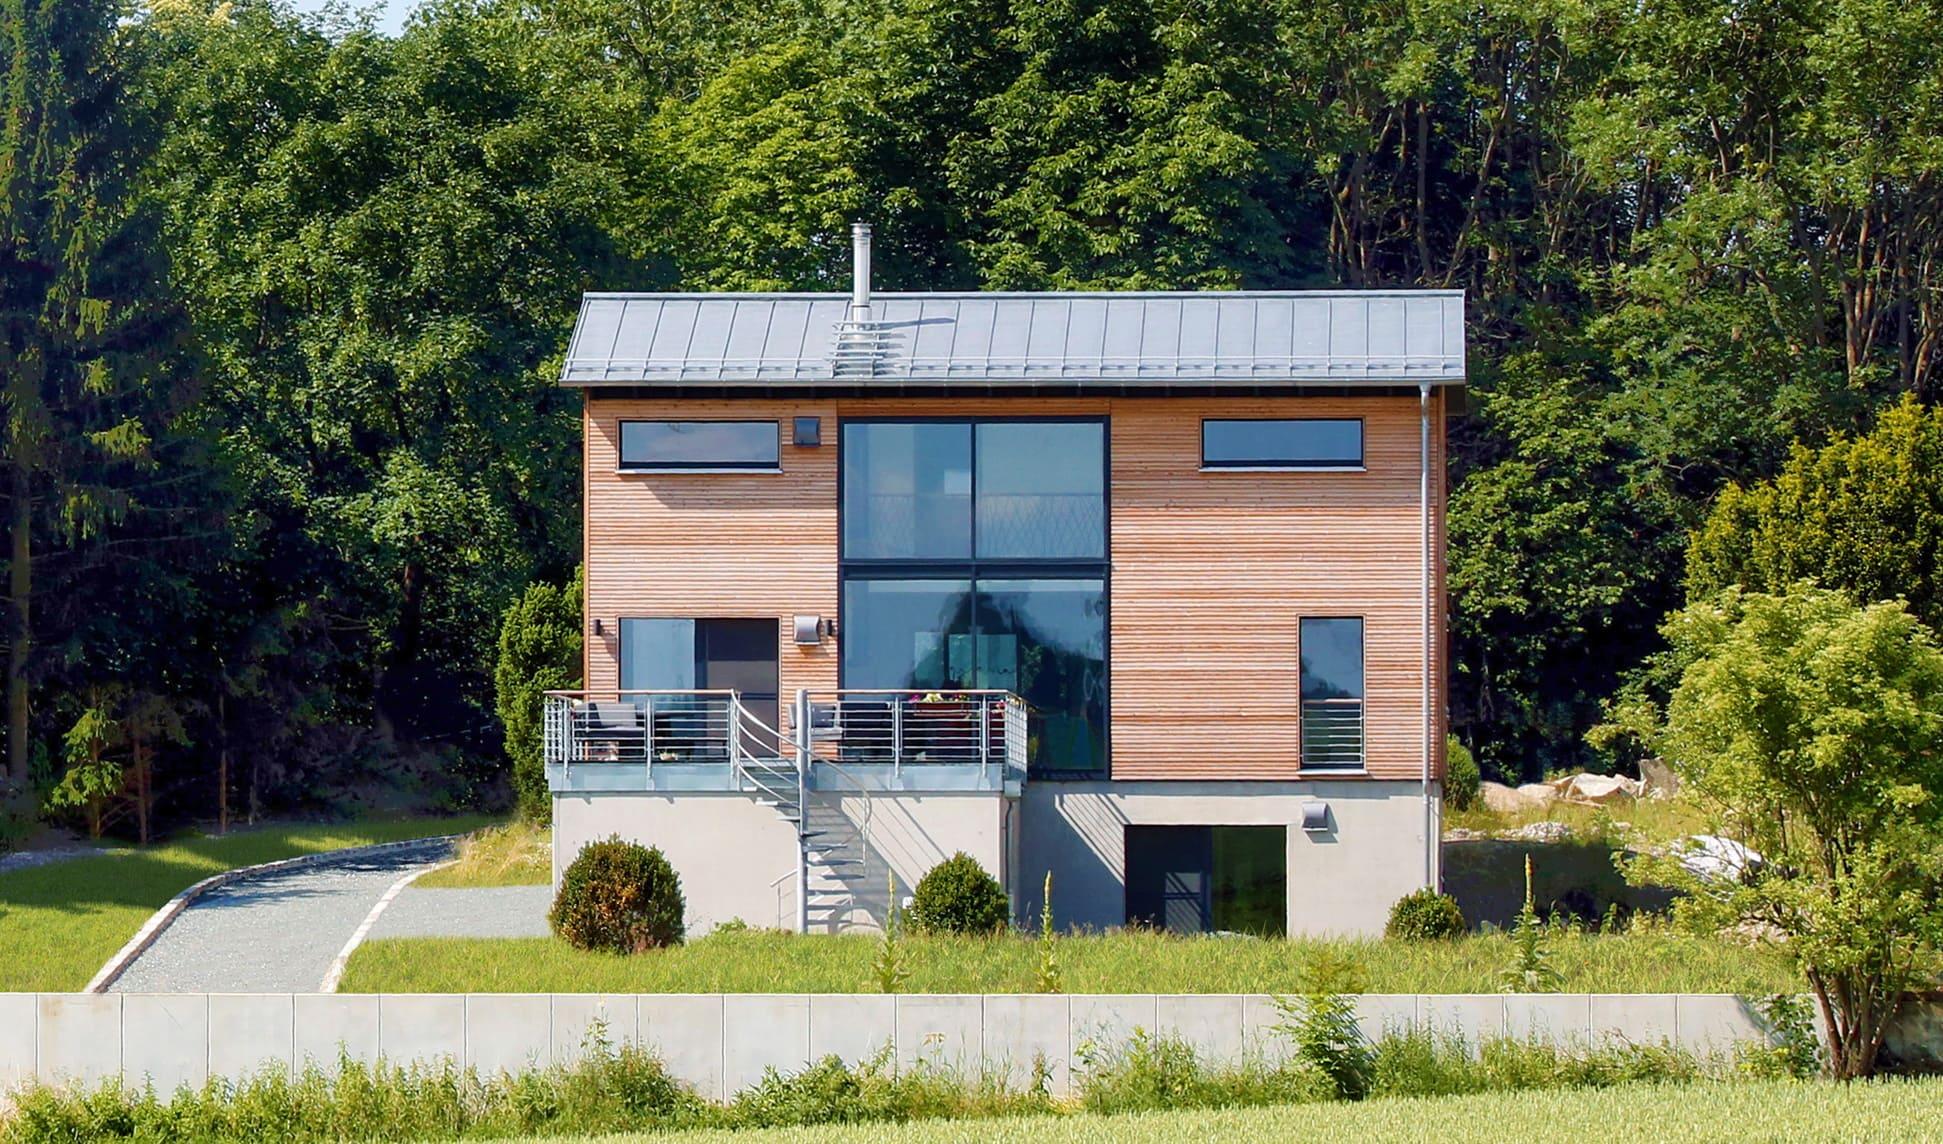 Architektenhaus modern mit Galerie, Holz Fassade & Satteldach, 5 Zimmer, 210 qm - Fertighaus bauen Ideen Baufritz Haus SCHELLENBERG - HausbauDirekt.de